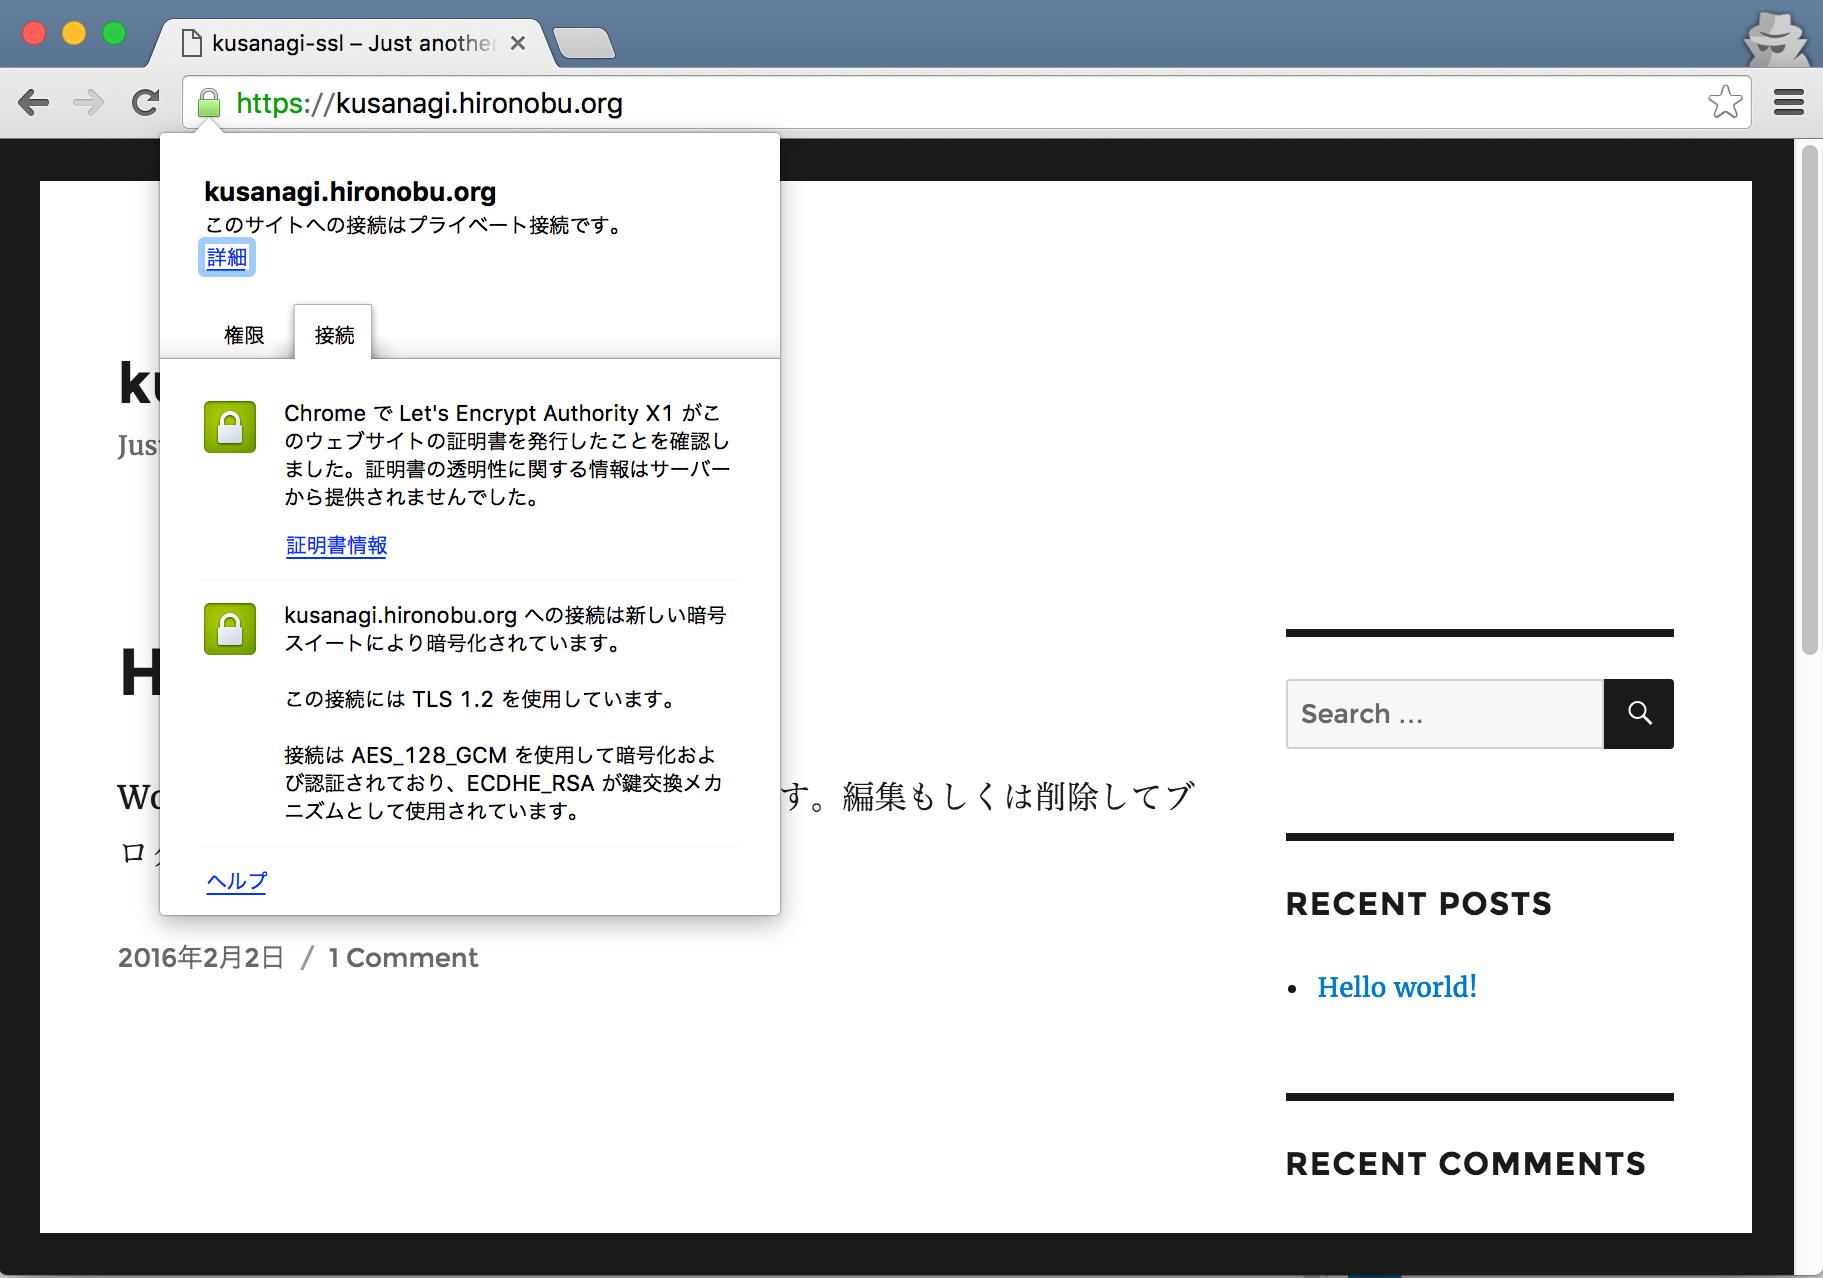 kusanagi-ssl_–_Just_another_WordPress_site_と_新規投稿_-_Qiita.png